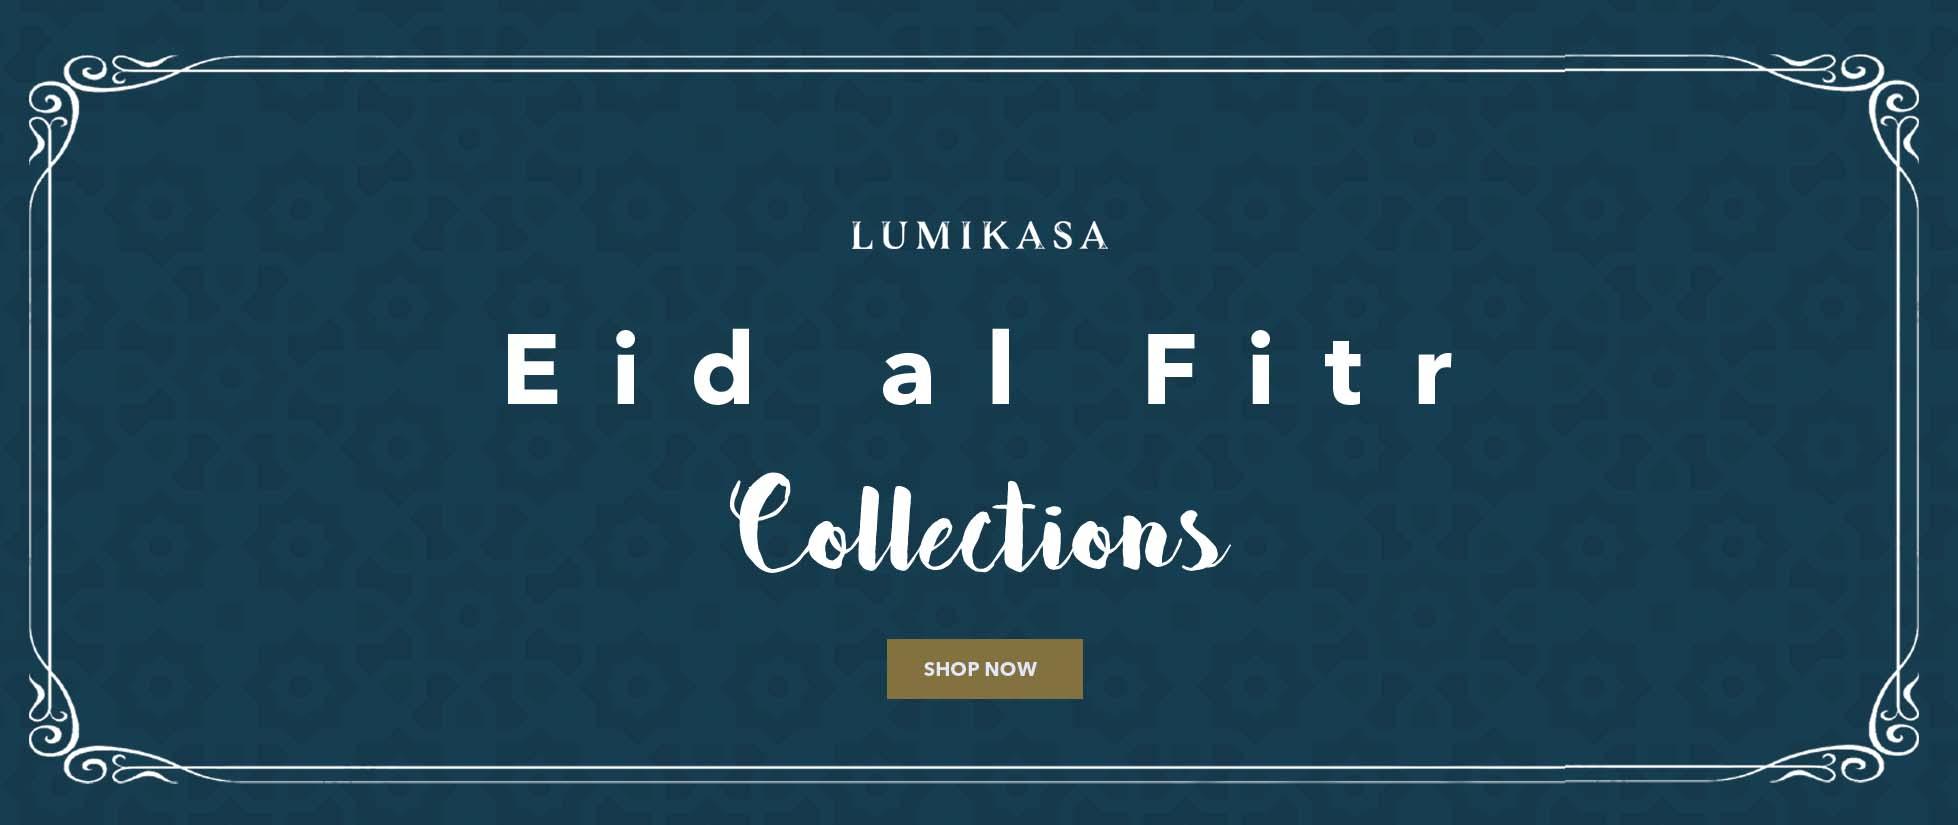 Eid Al Fitr Collections